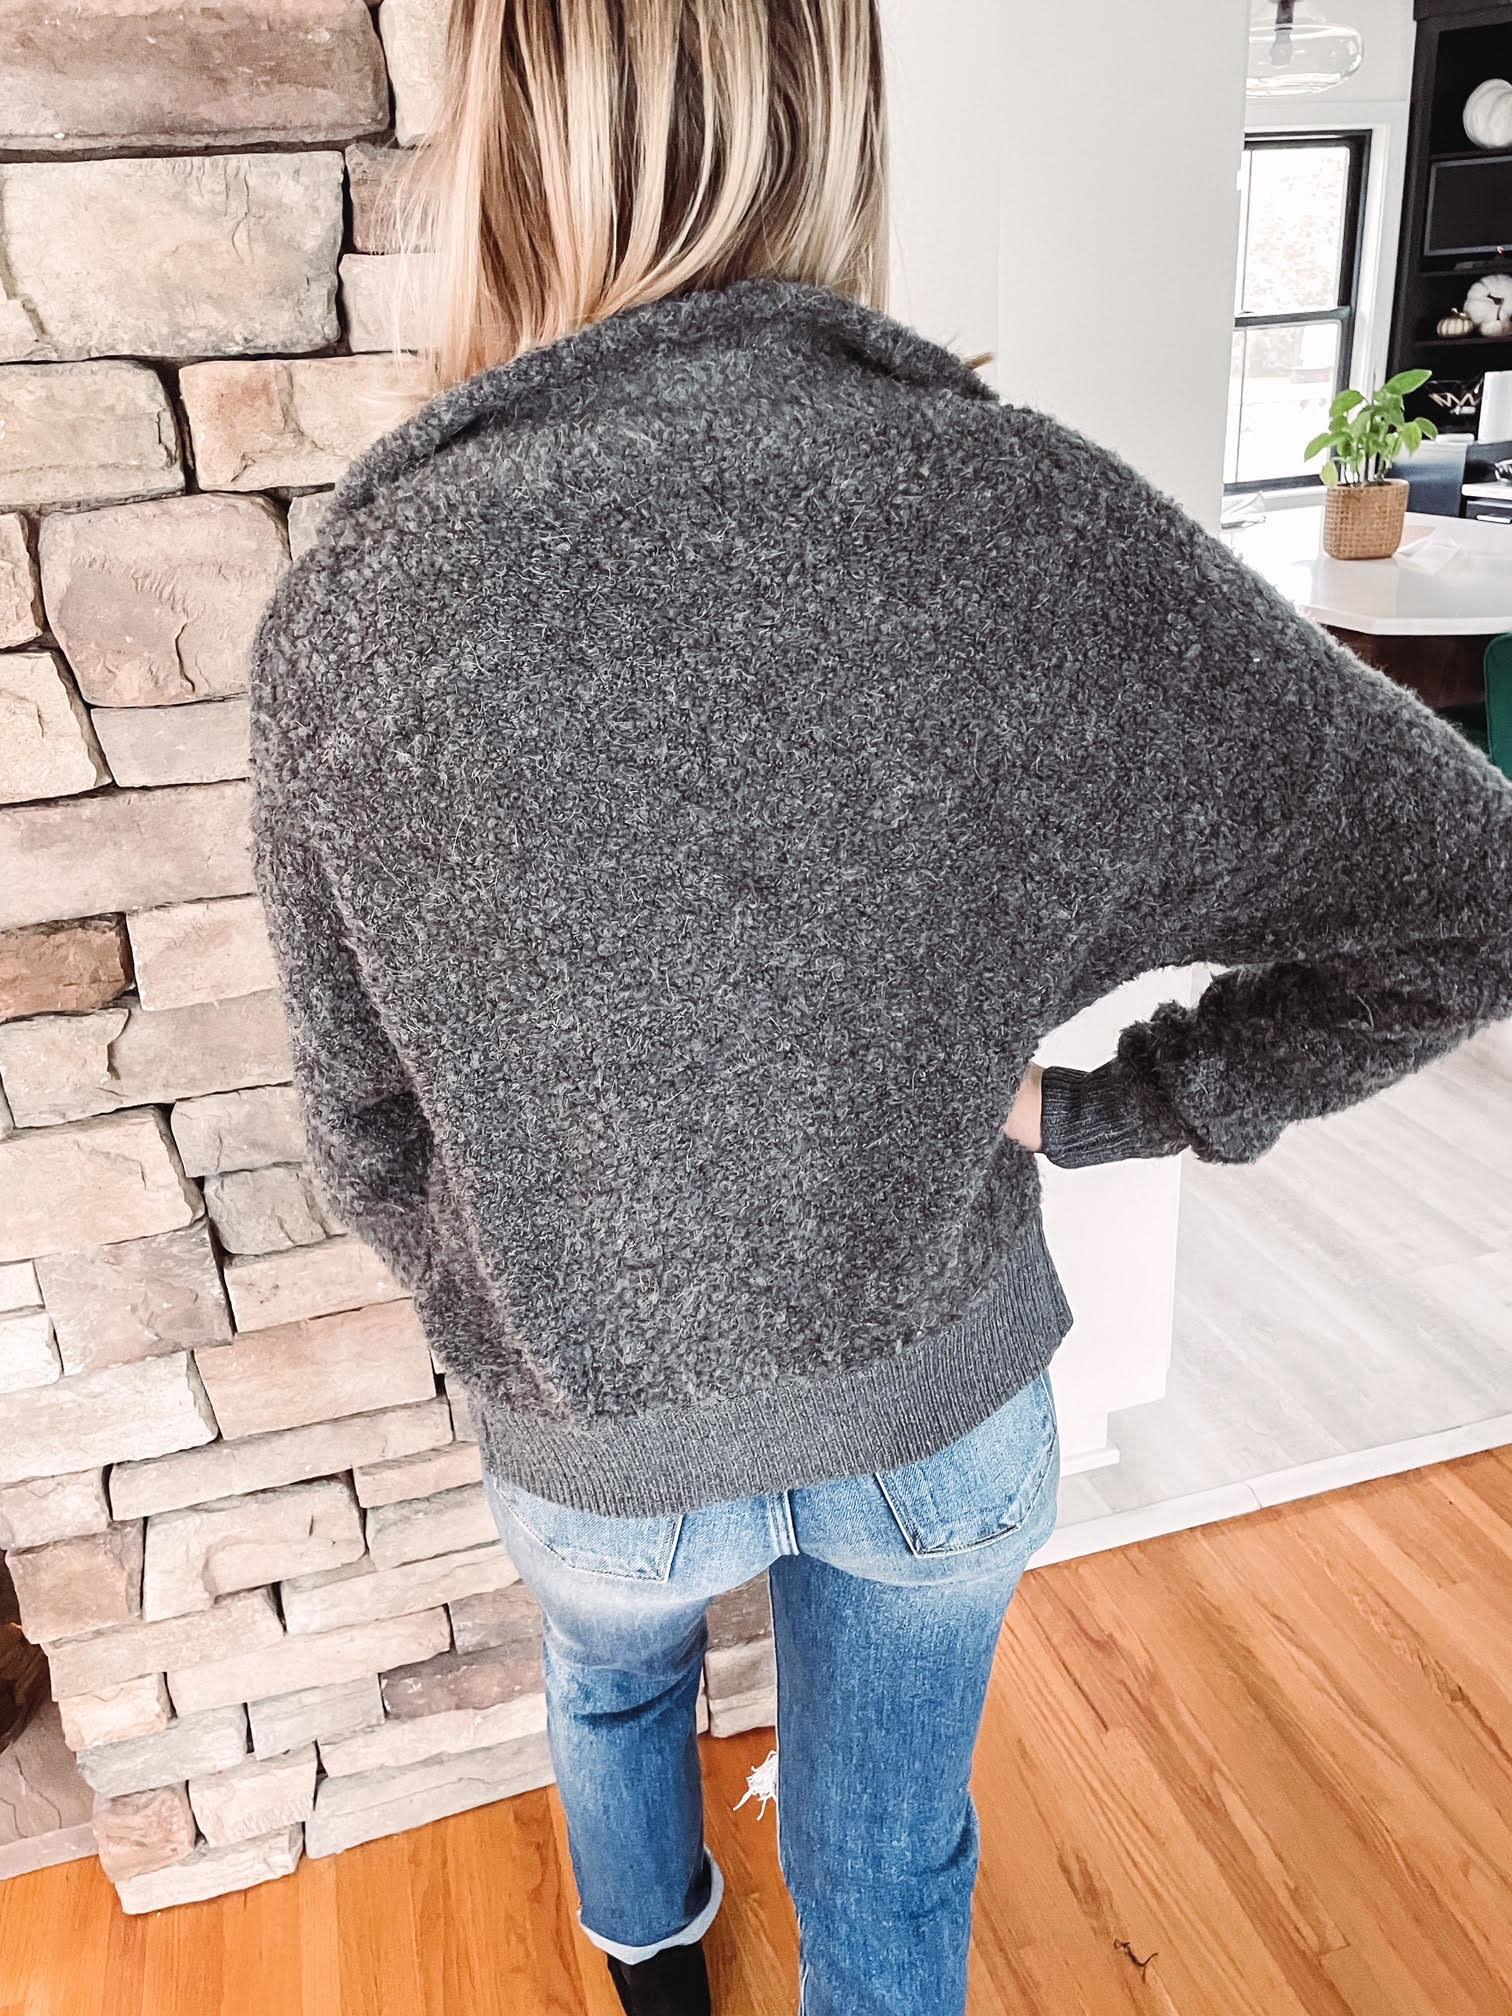 Charcoal Fuzzy Zip Up